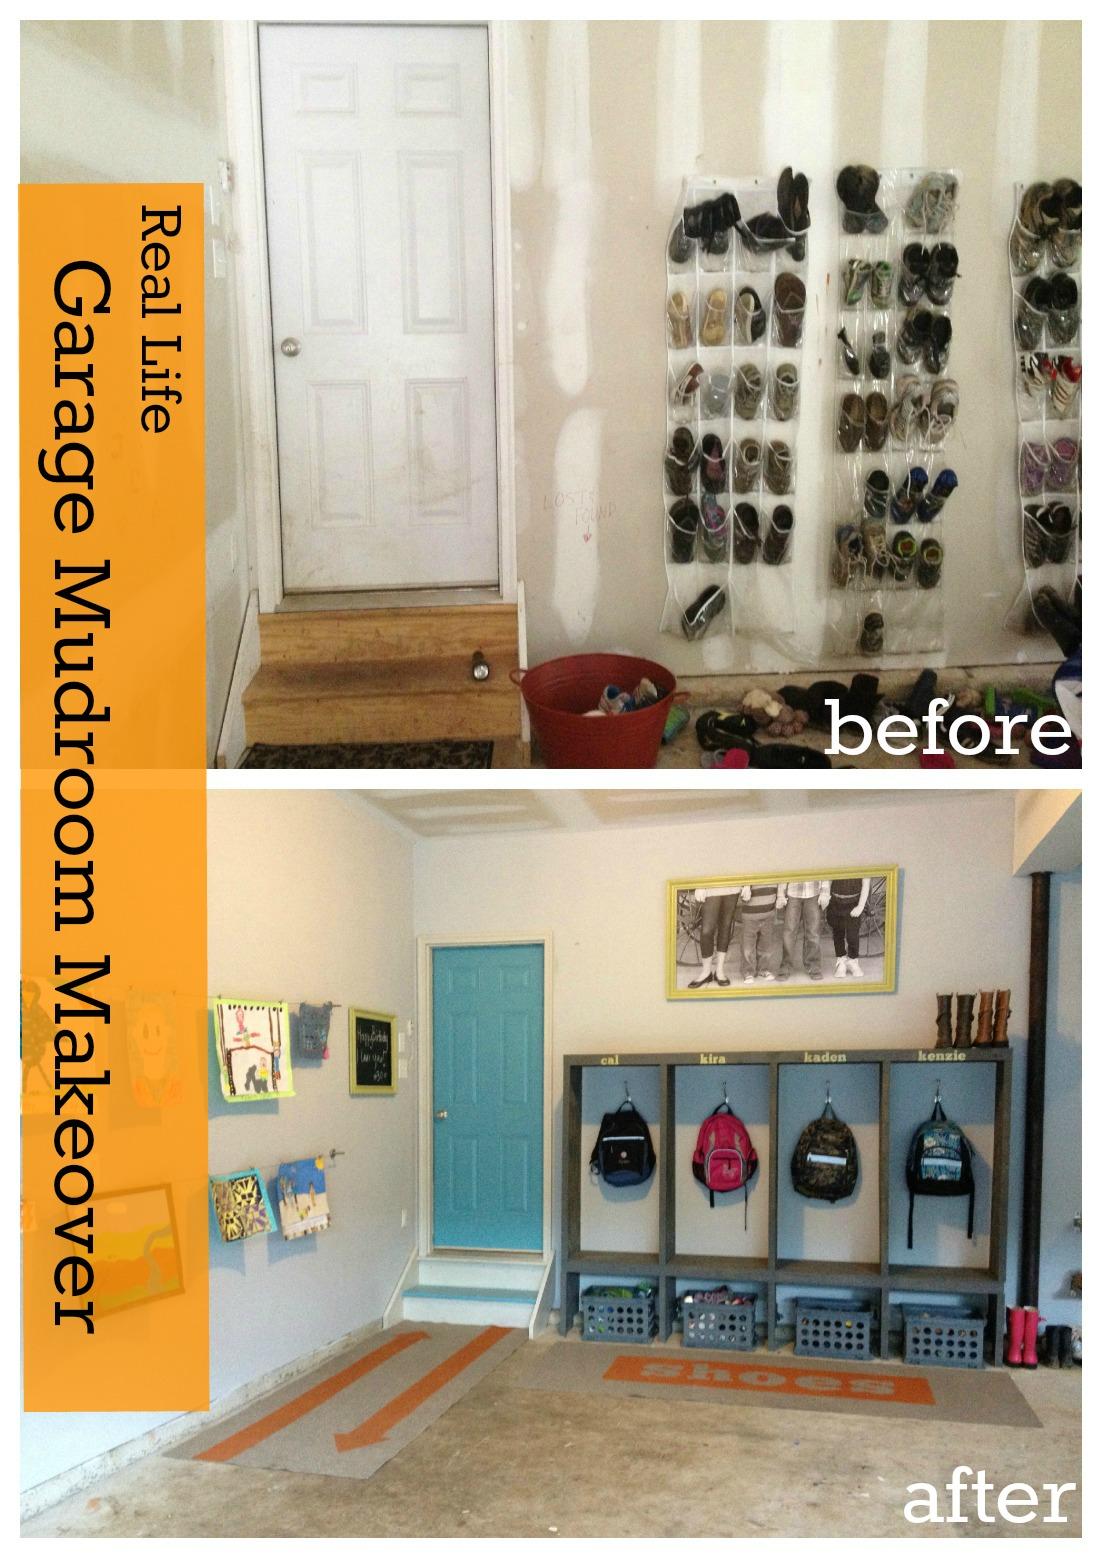 Custom Painted Runner Rugs Garage Mudroom Makeover